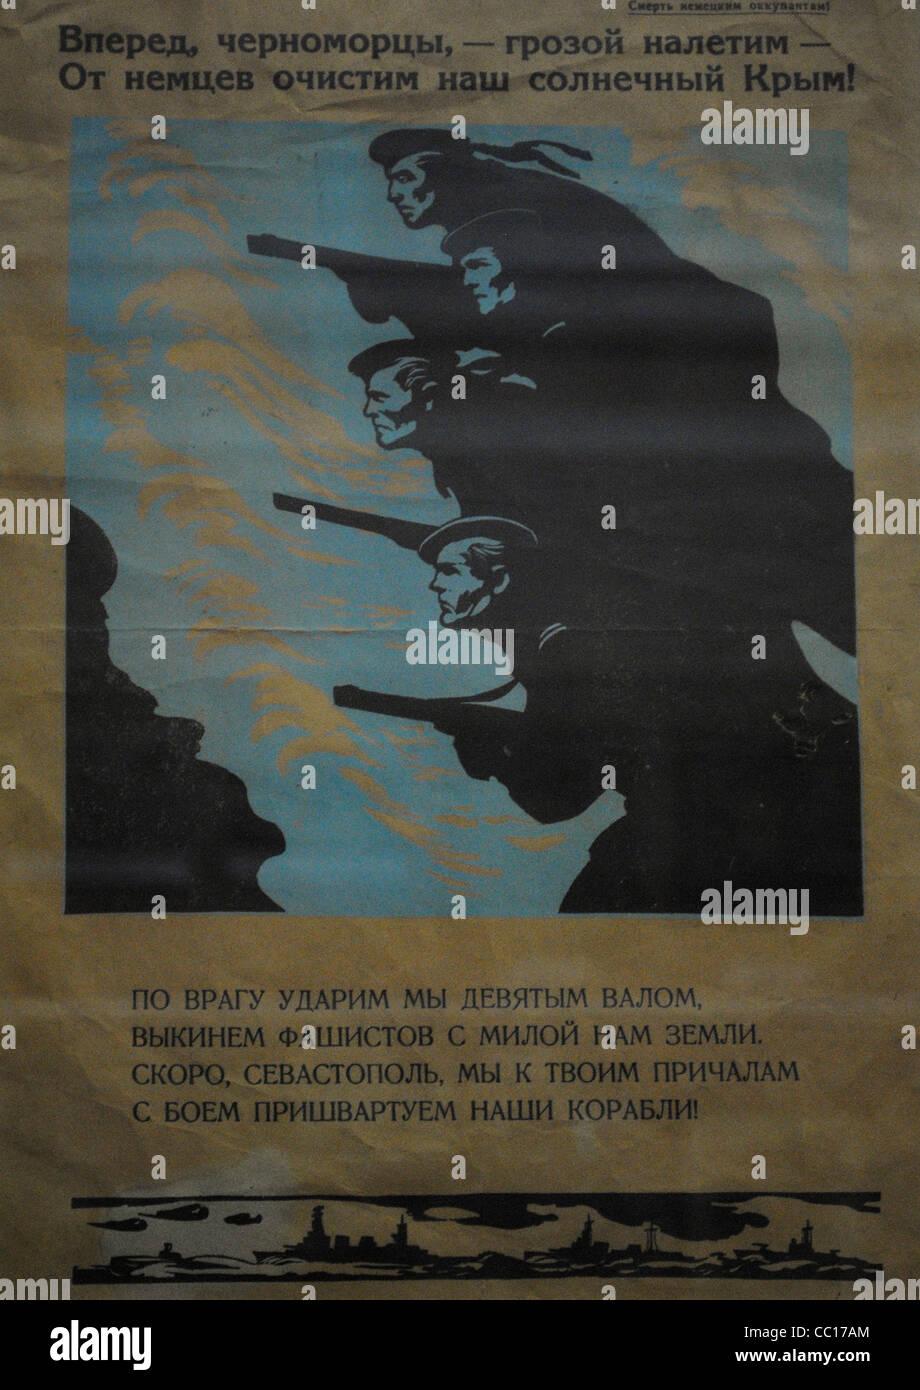 Second World War. Poster of the Russian army. Museum of Black Sea Fleet. Sevastopol. Crimean Peninsula. Ukraine. - Stock Image